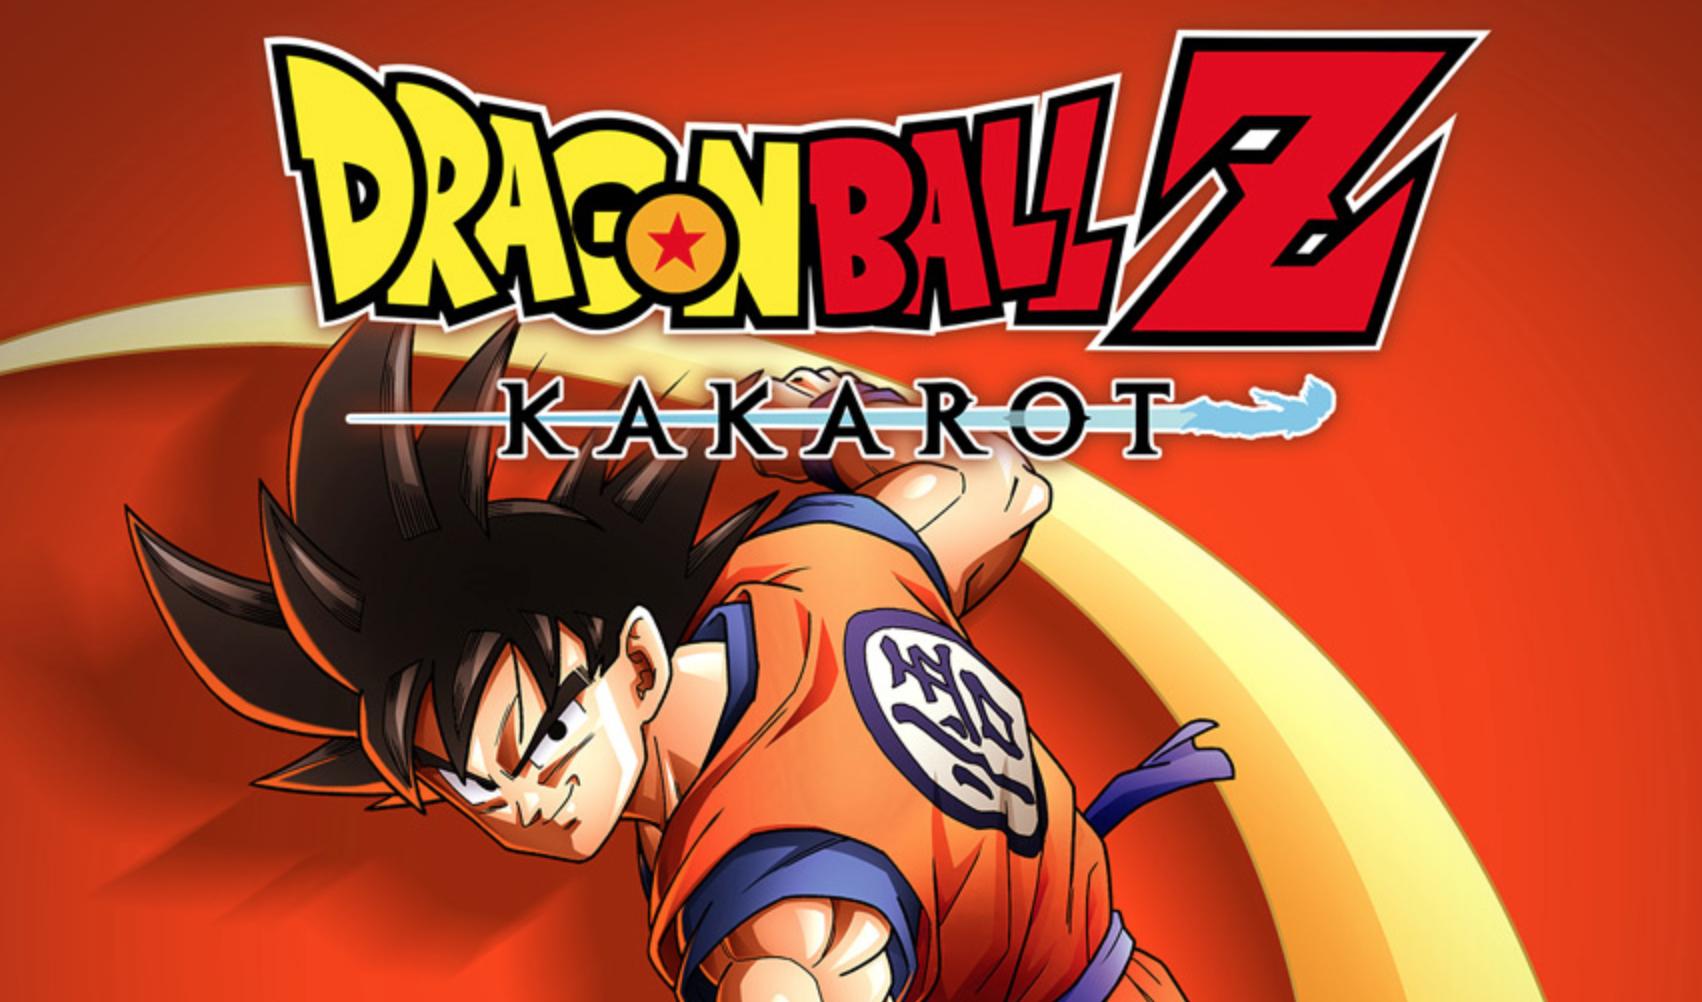 Dragon Ball Z: Kakarot Available Now on PS4, xbox 1